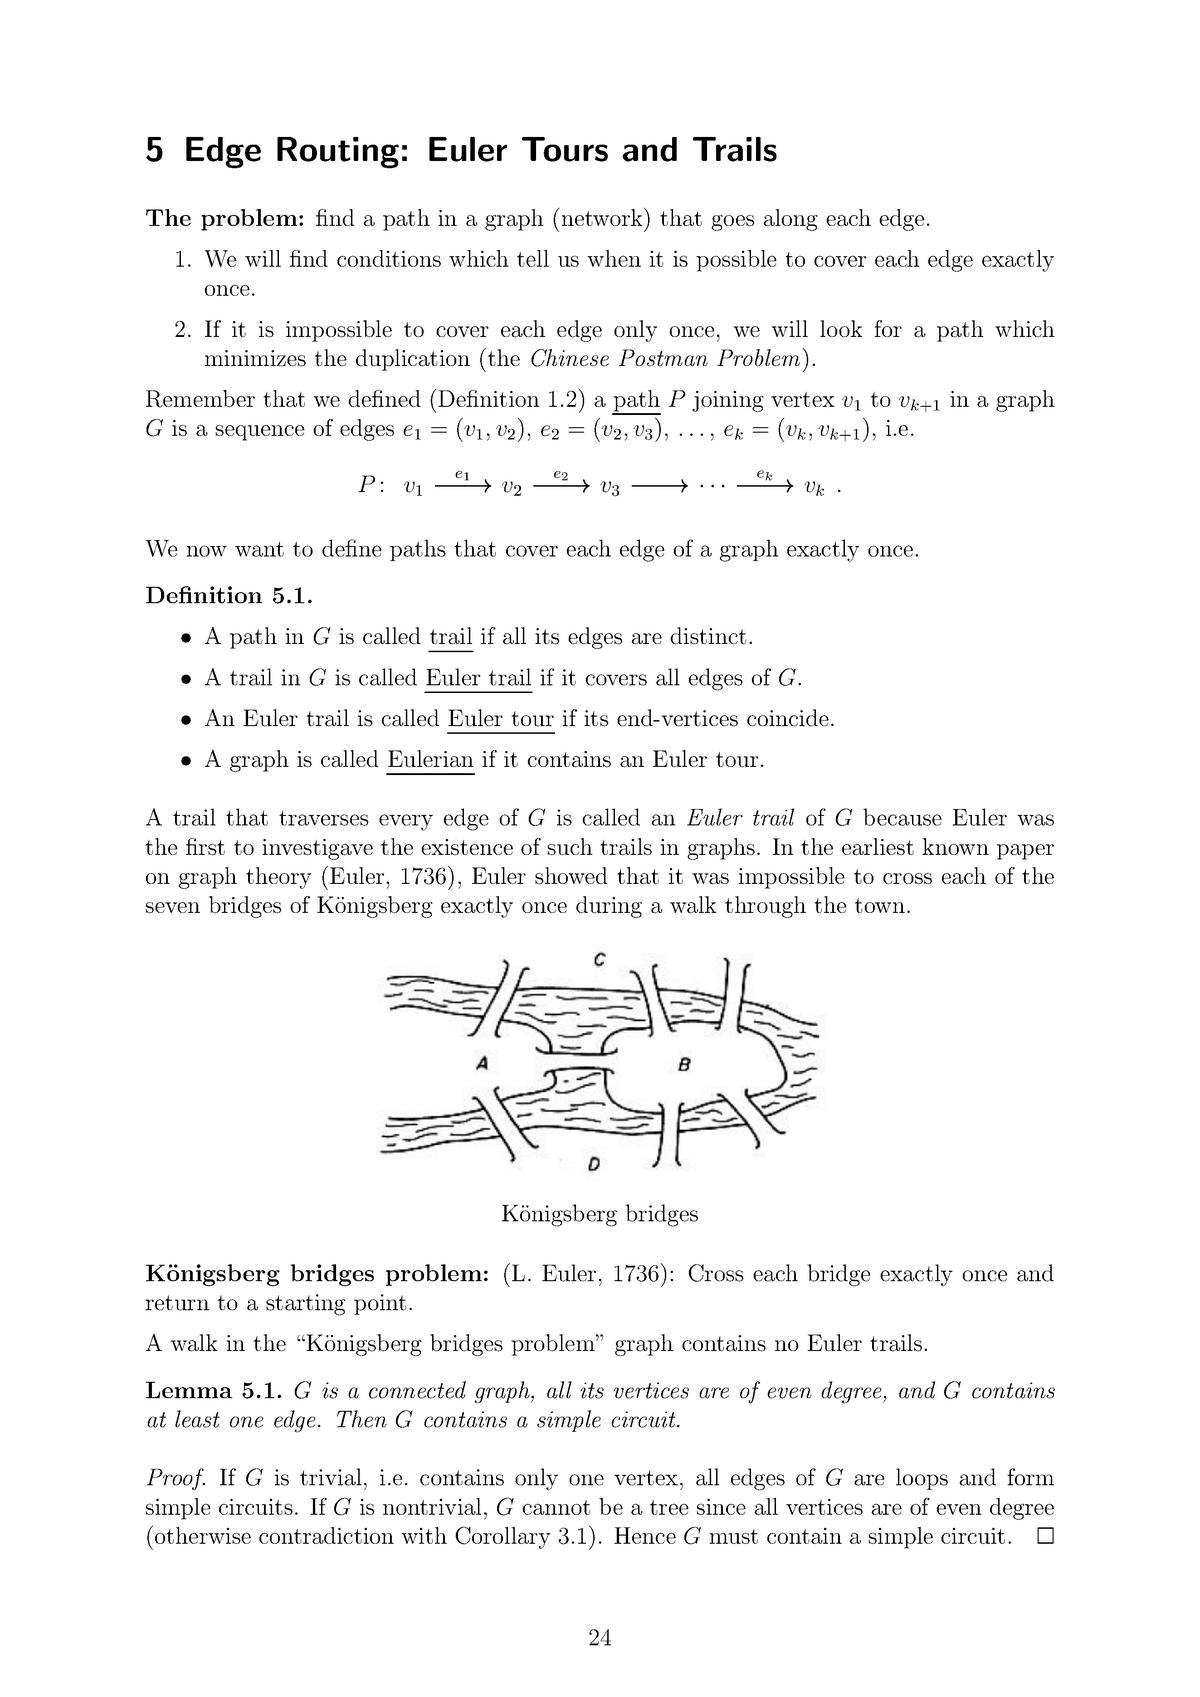 MATH367 notes - MATH362: Applied Probability - StuDocu